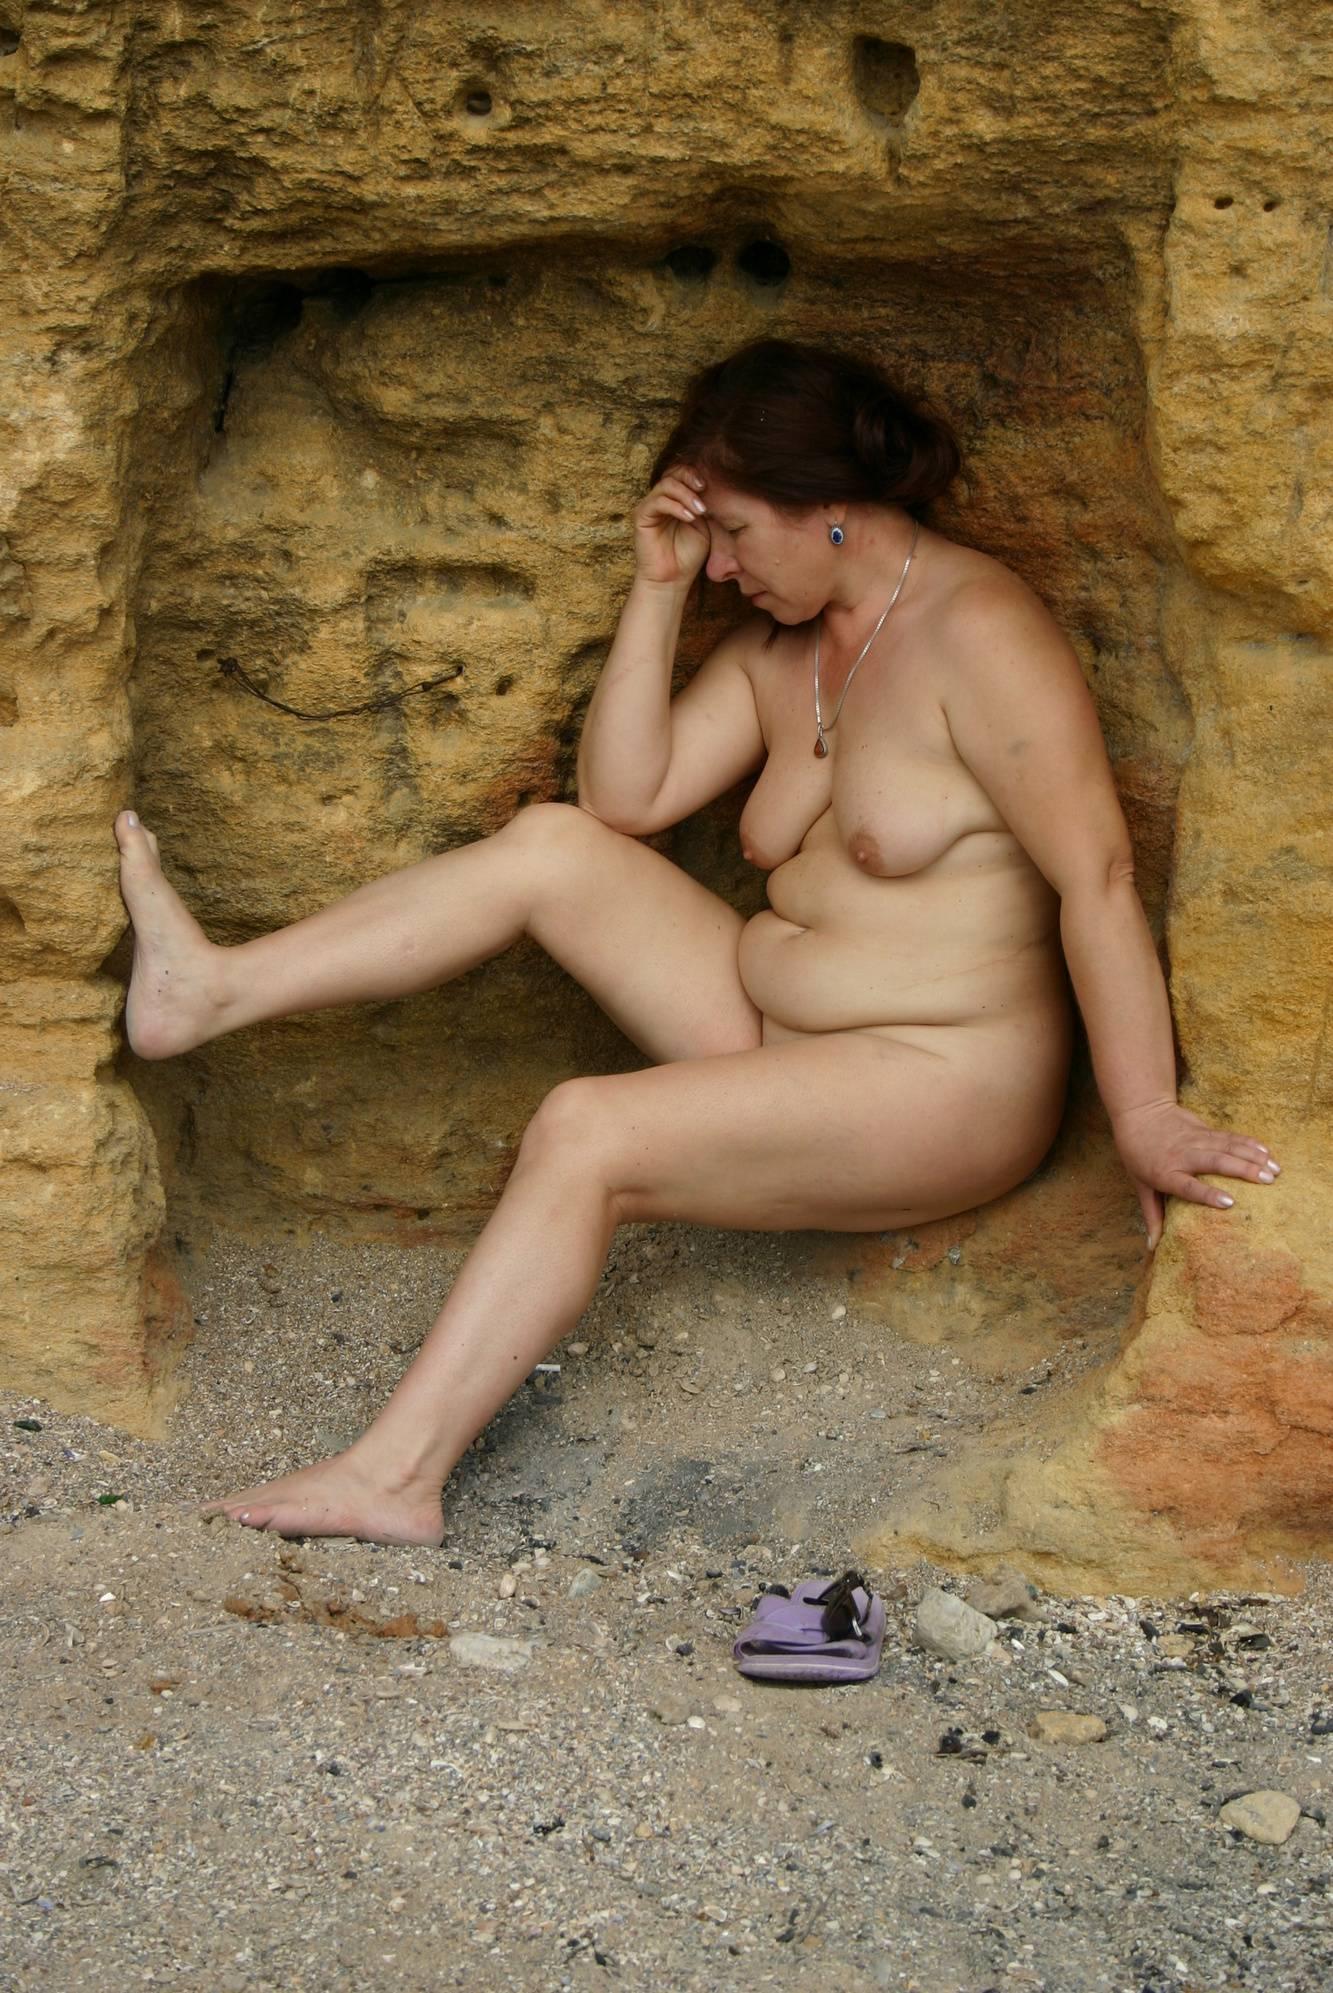 Nudist Photos Body Paint Rock Profiles - 1